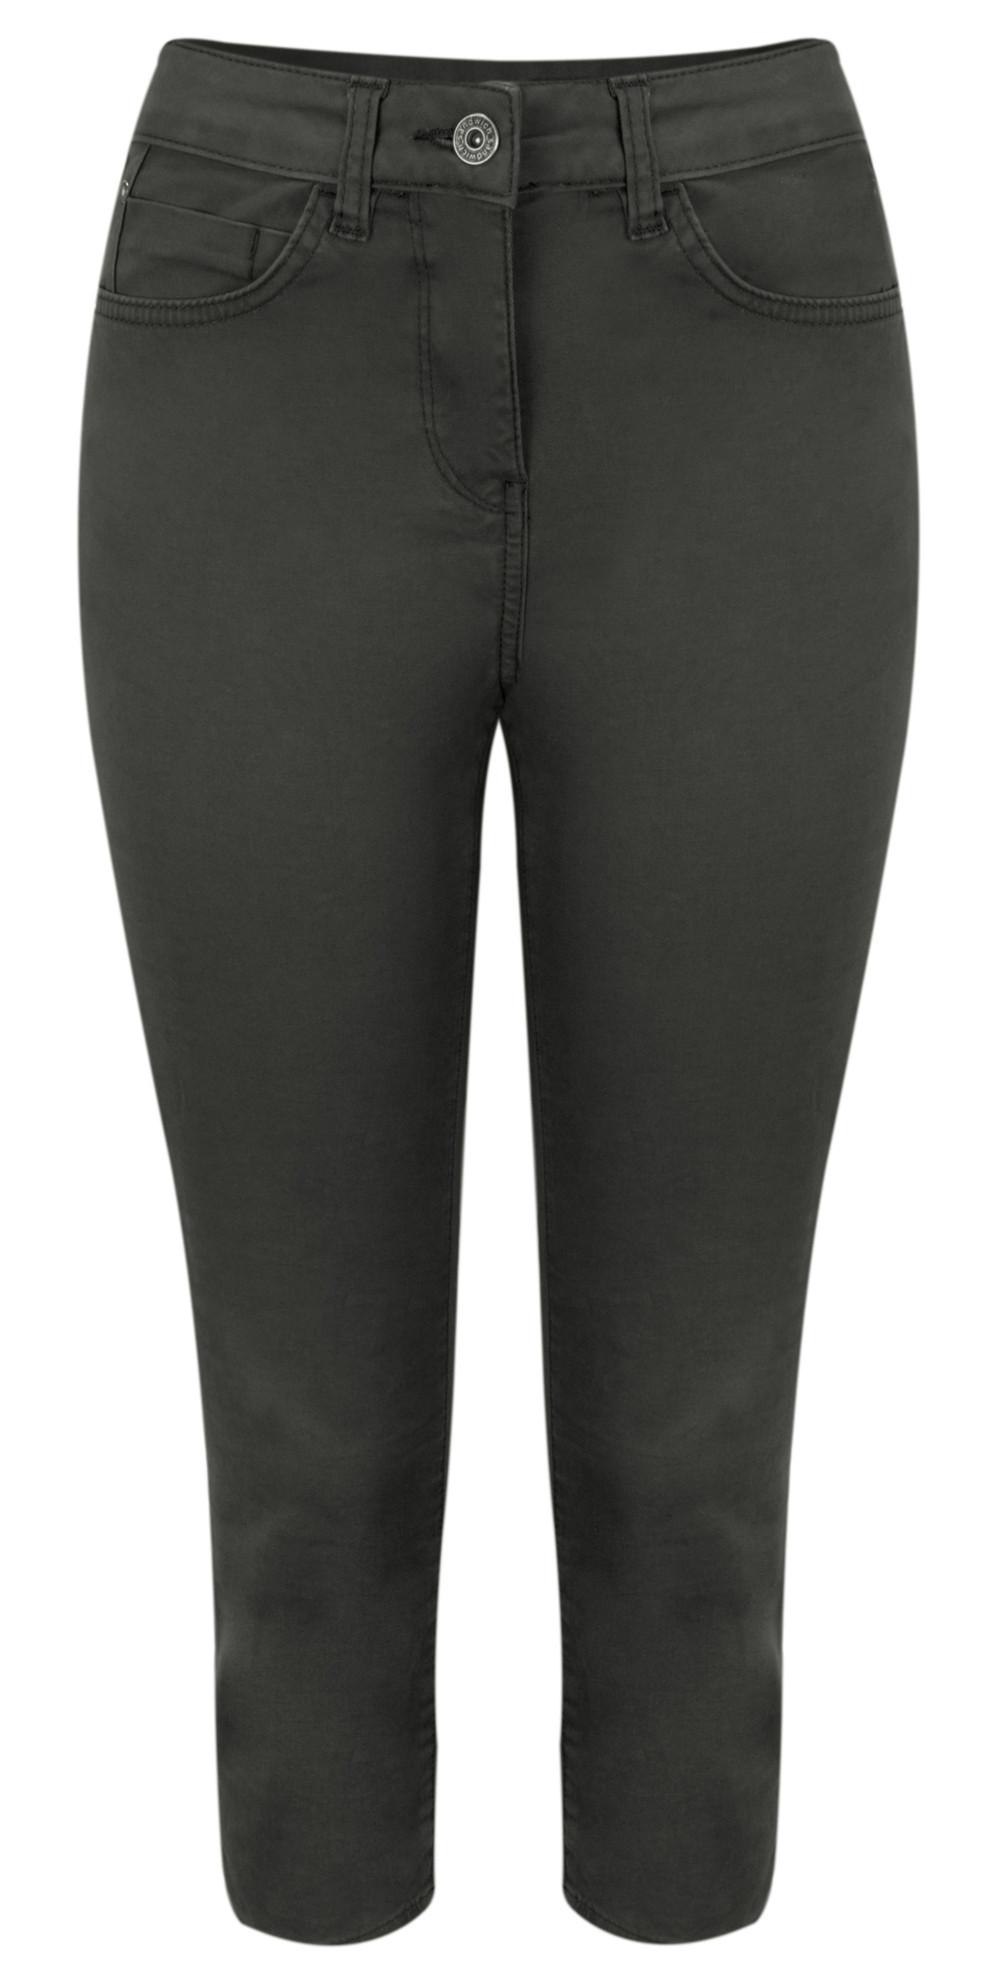 High Waist Skinny Stretch Casual Trouser main image